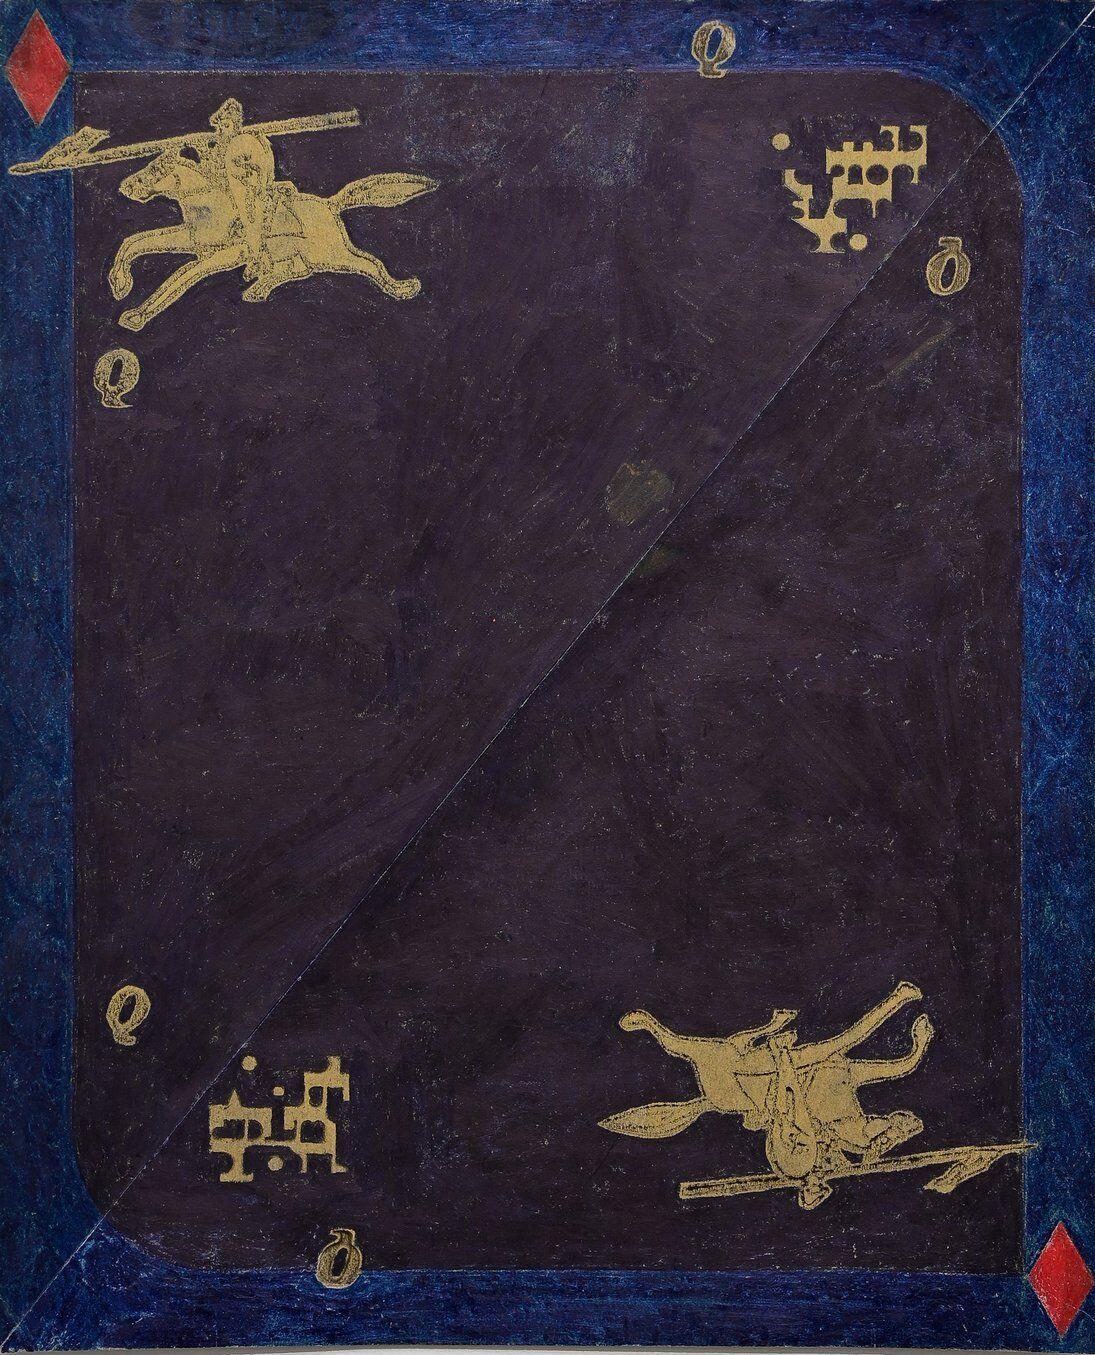 toru otani blue knight queen of diamonds